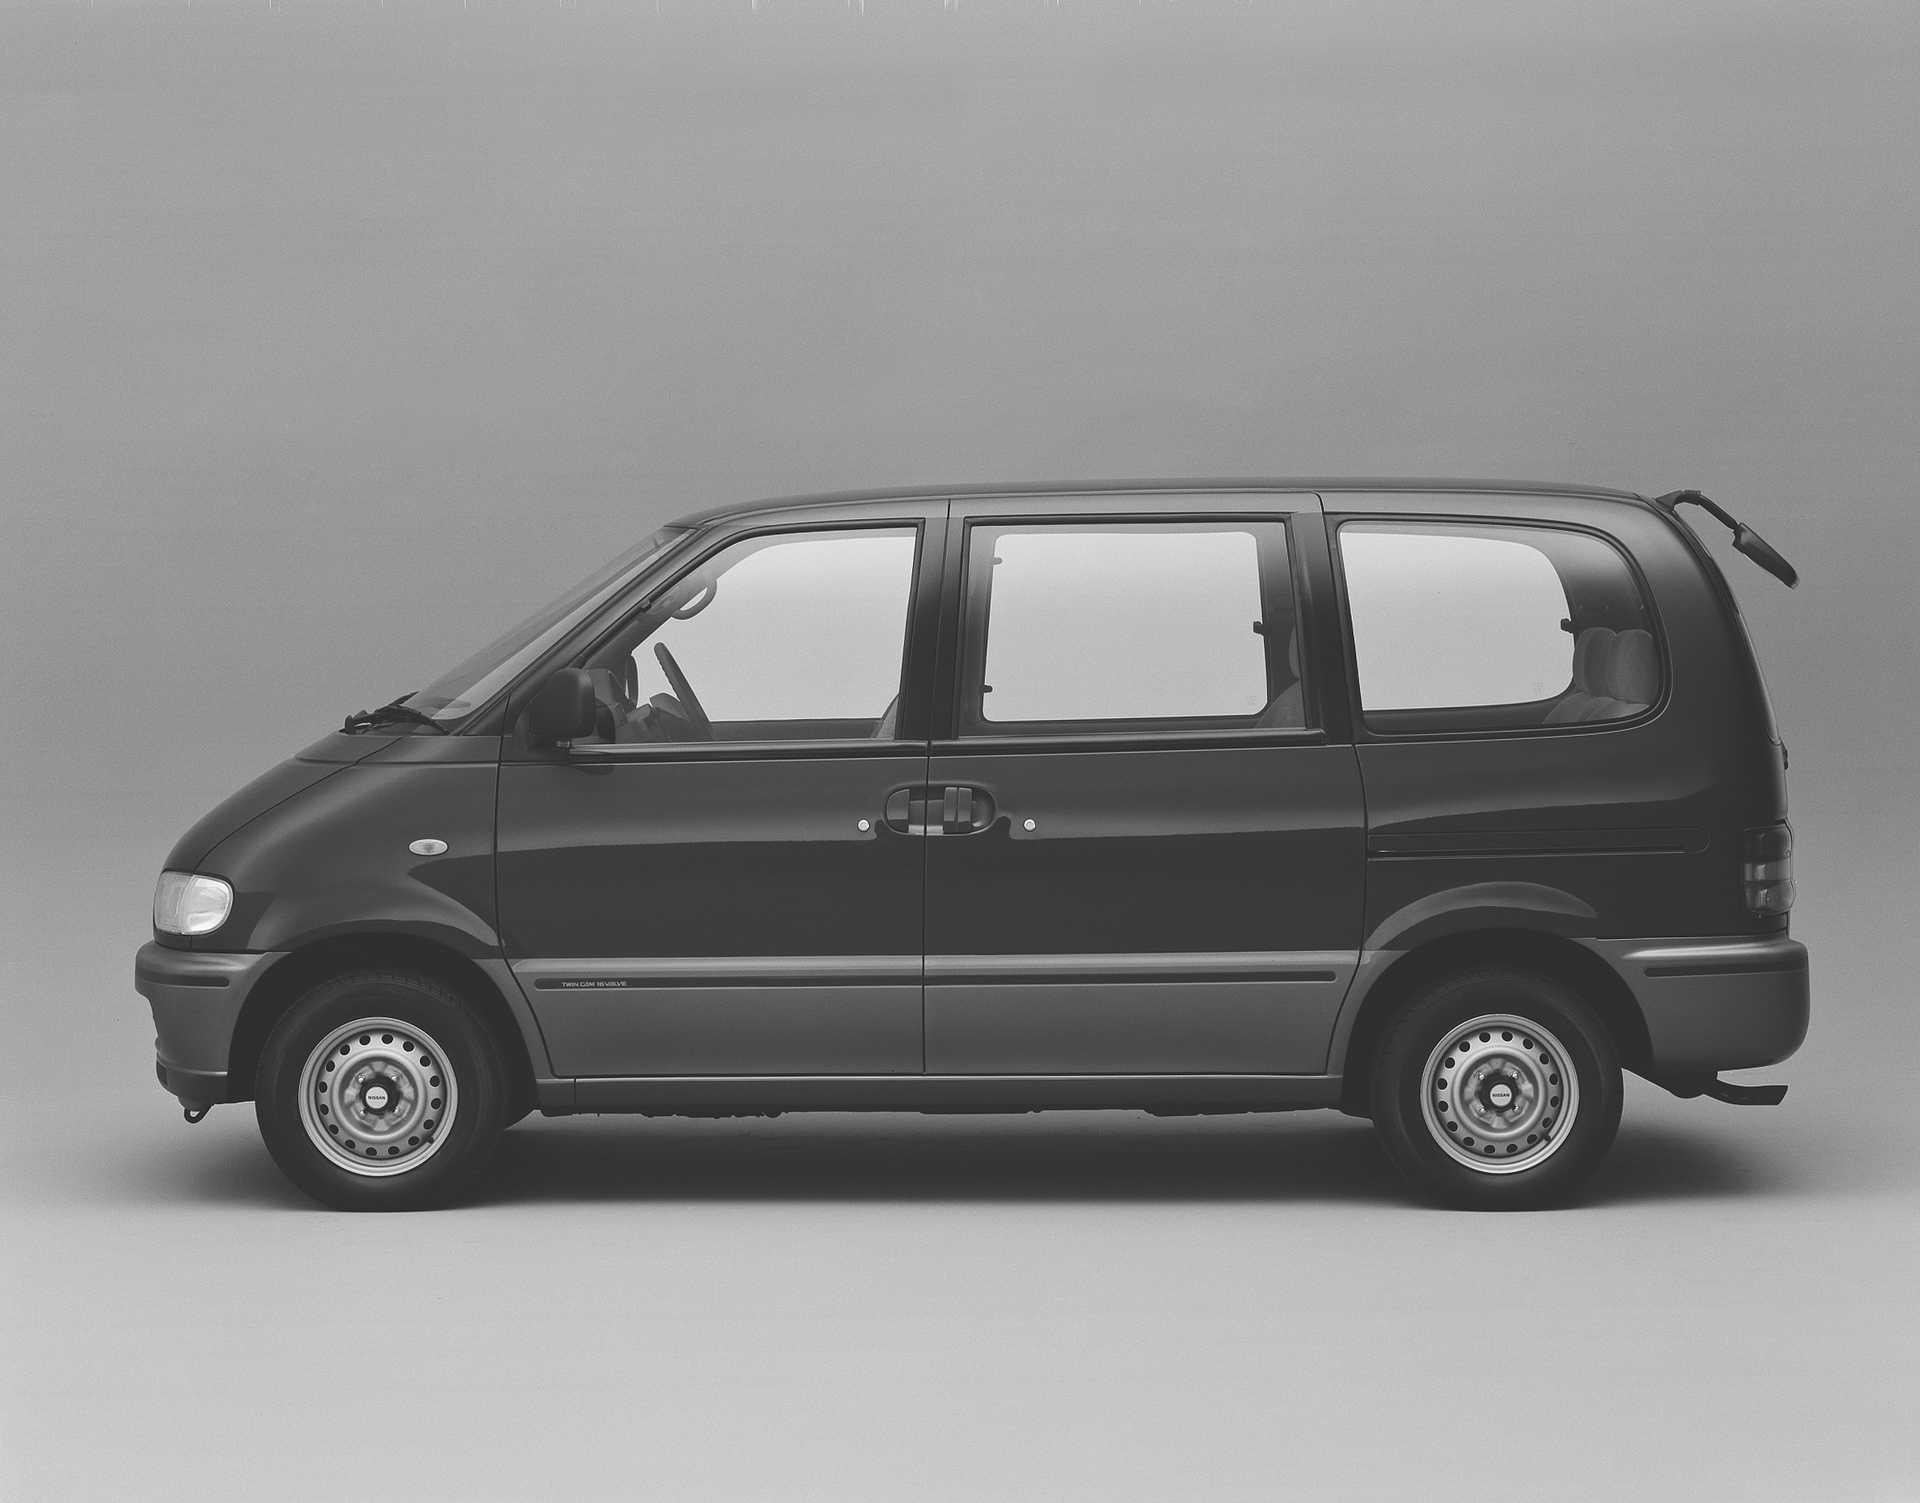 Nissan Serena I (C23) 1991 - 2002 Compact MPV #3